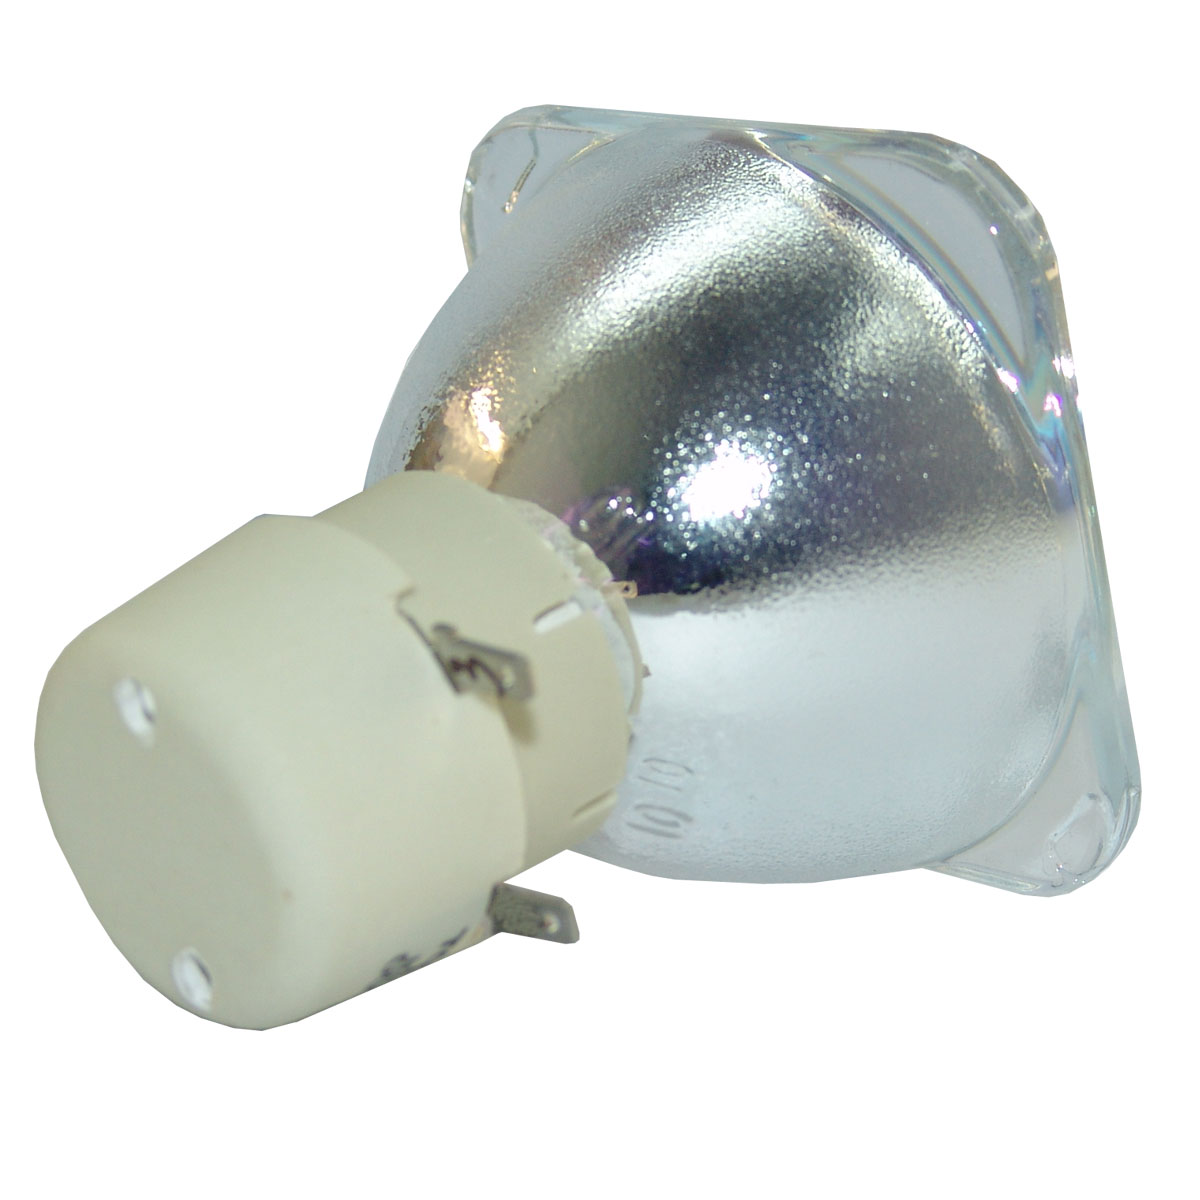 Lutema Platinum for Acer EC.JBM00.001 Projector Lamp Original Philips Bulb